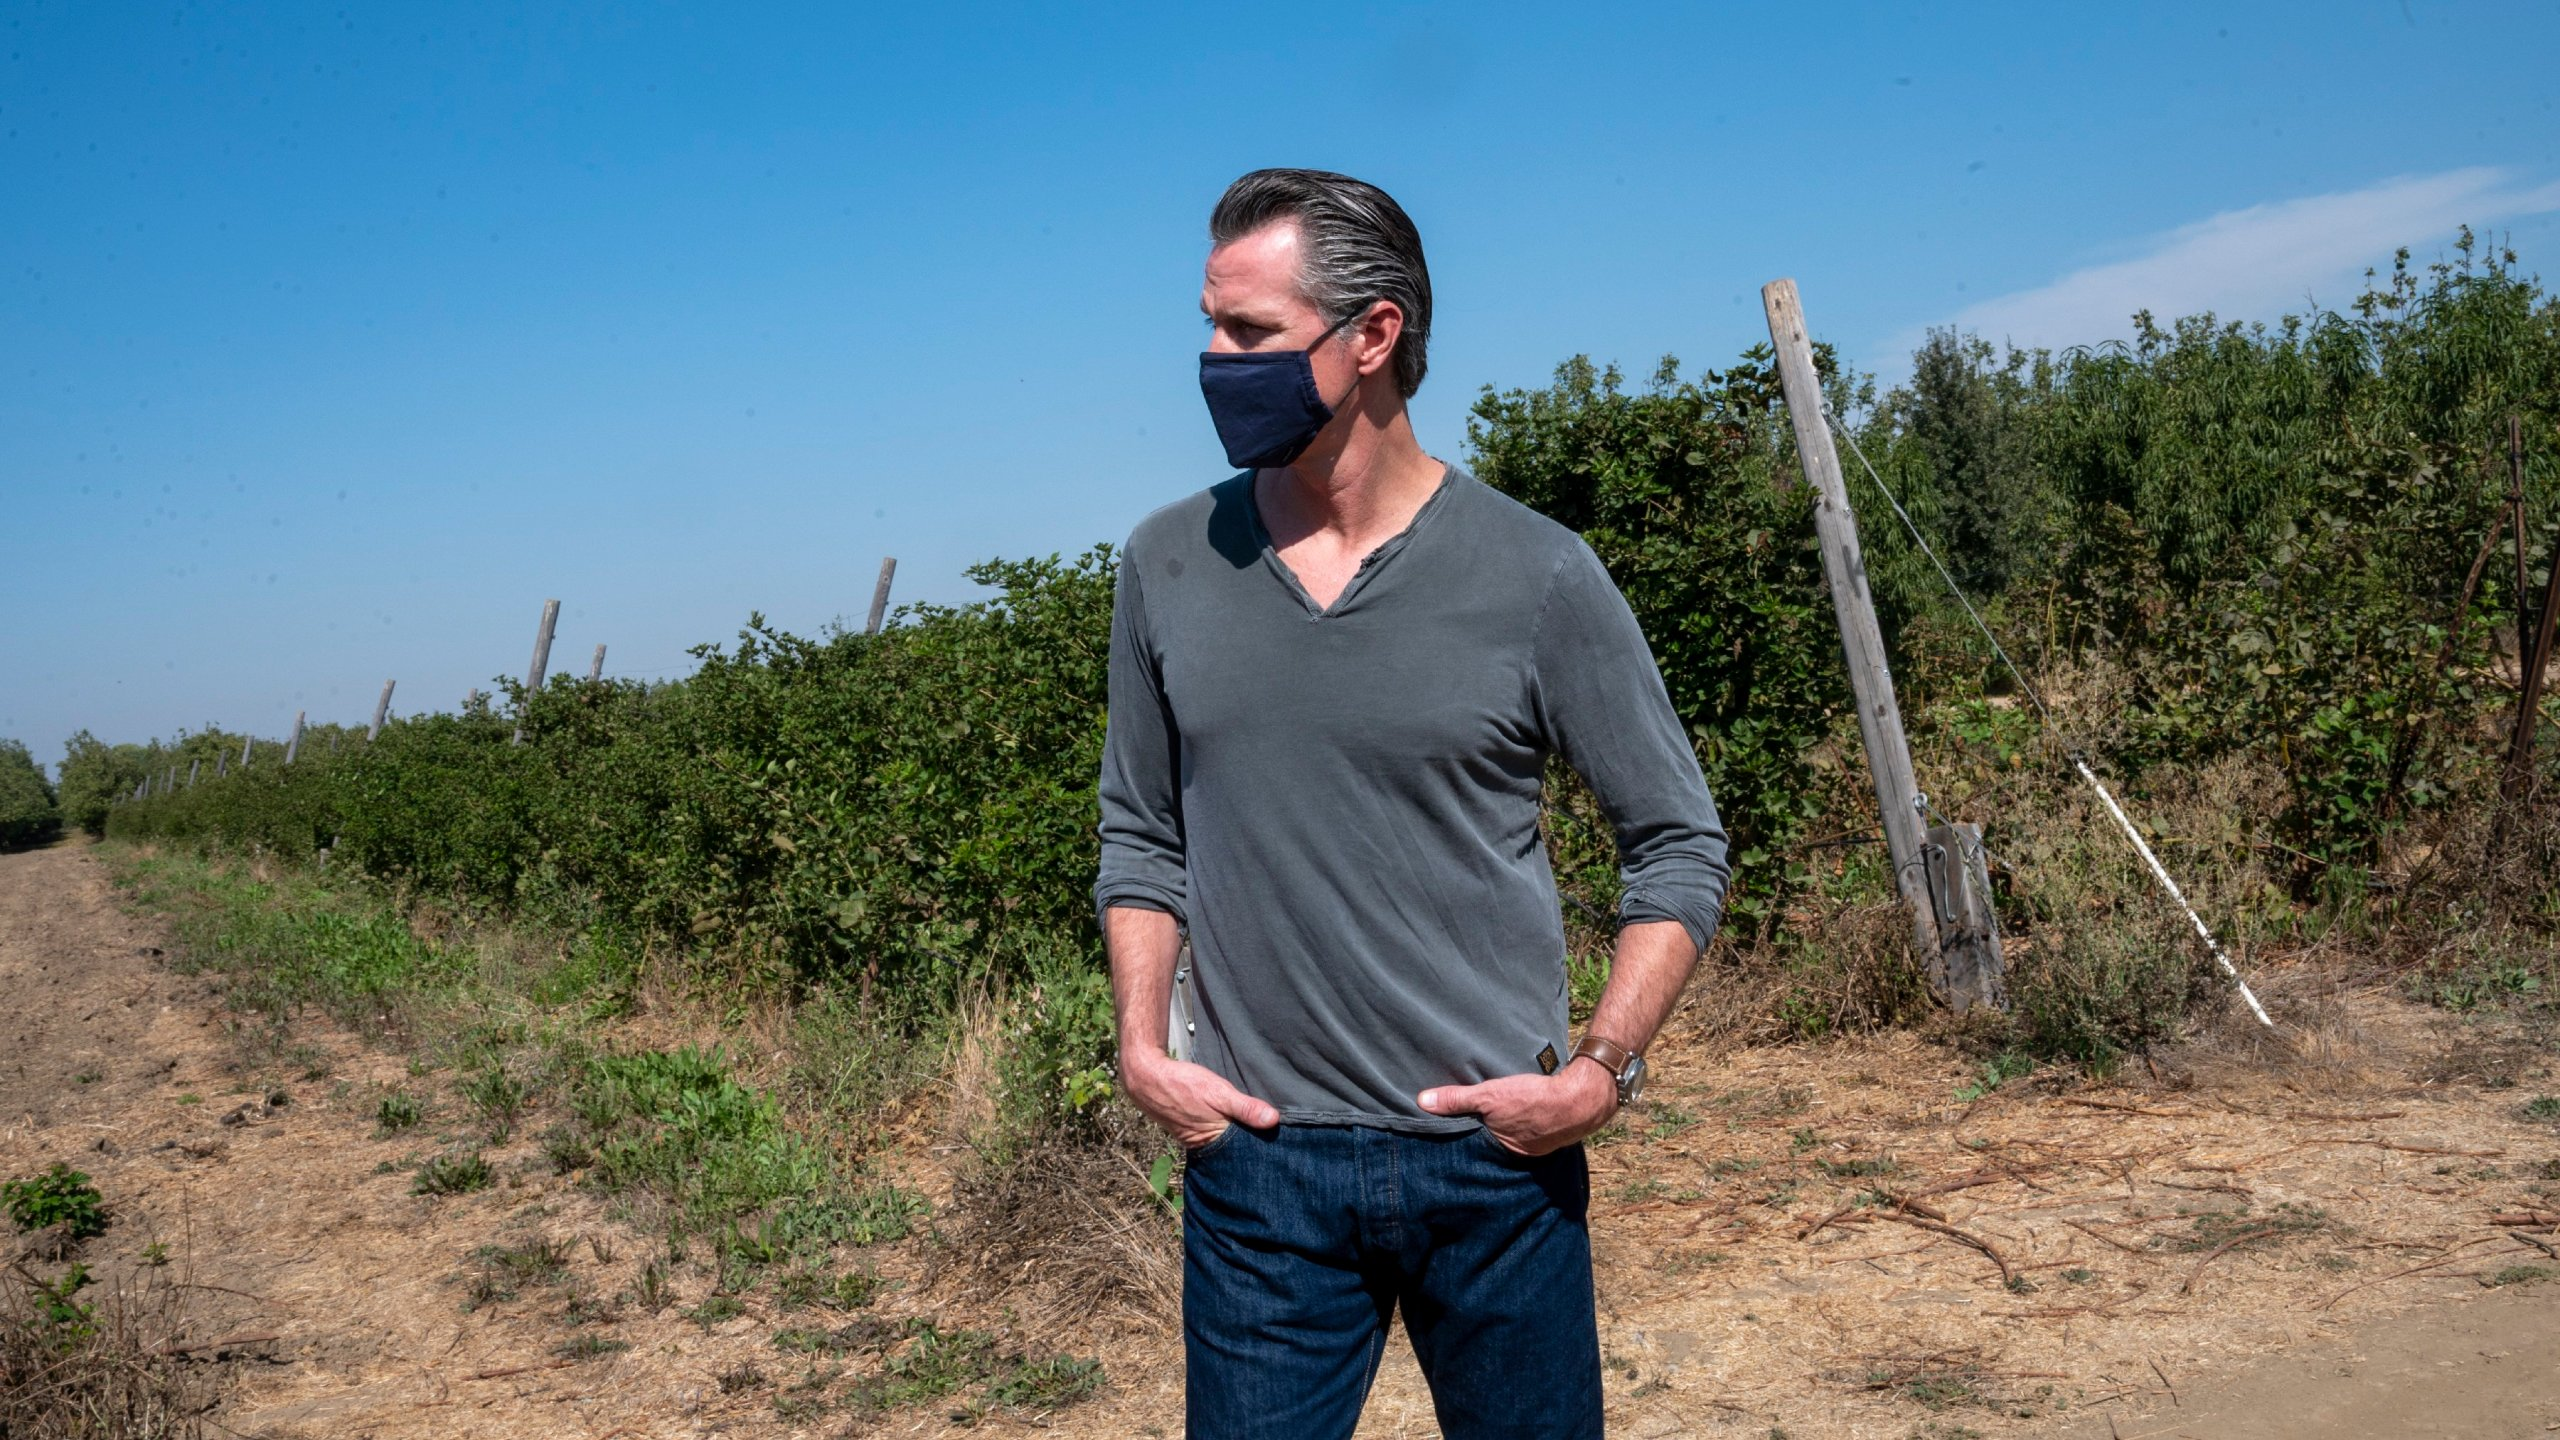 California Gov. Gavin Newsom tours Sierra Orchards walnut farm in Winters, Solano County, on Oct. 7, 2020. (Renée C. Byer / The Sacramento Bee via Associated Press)